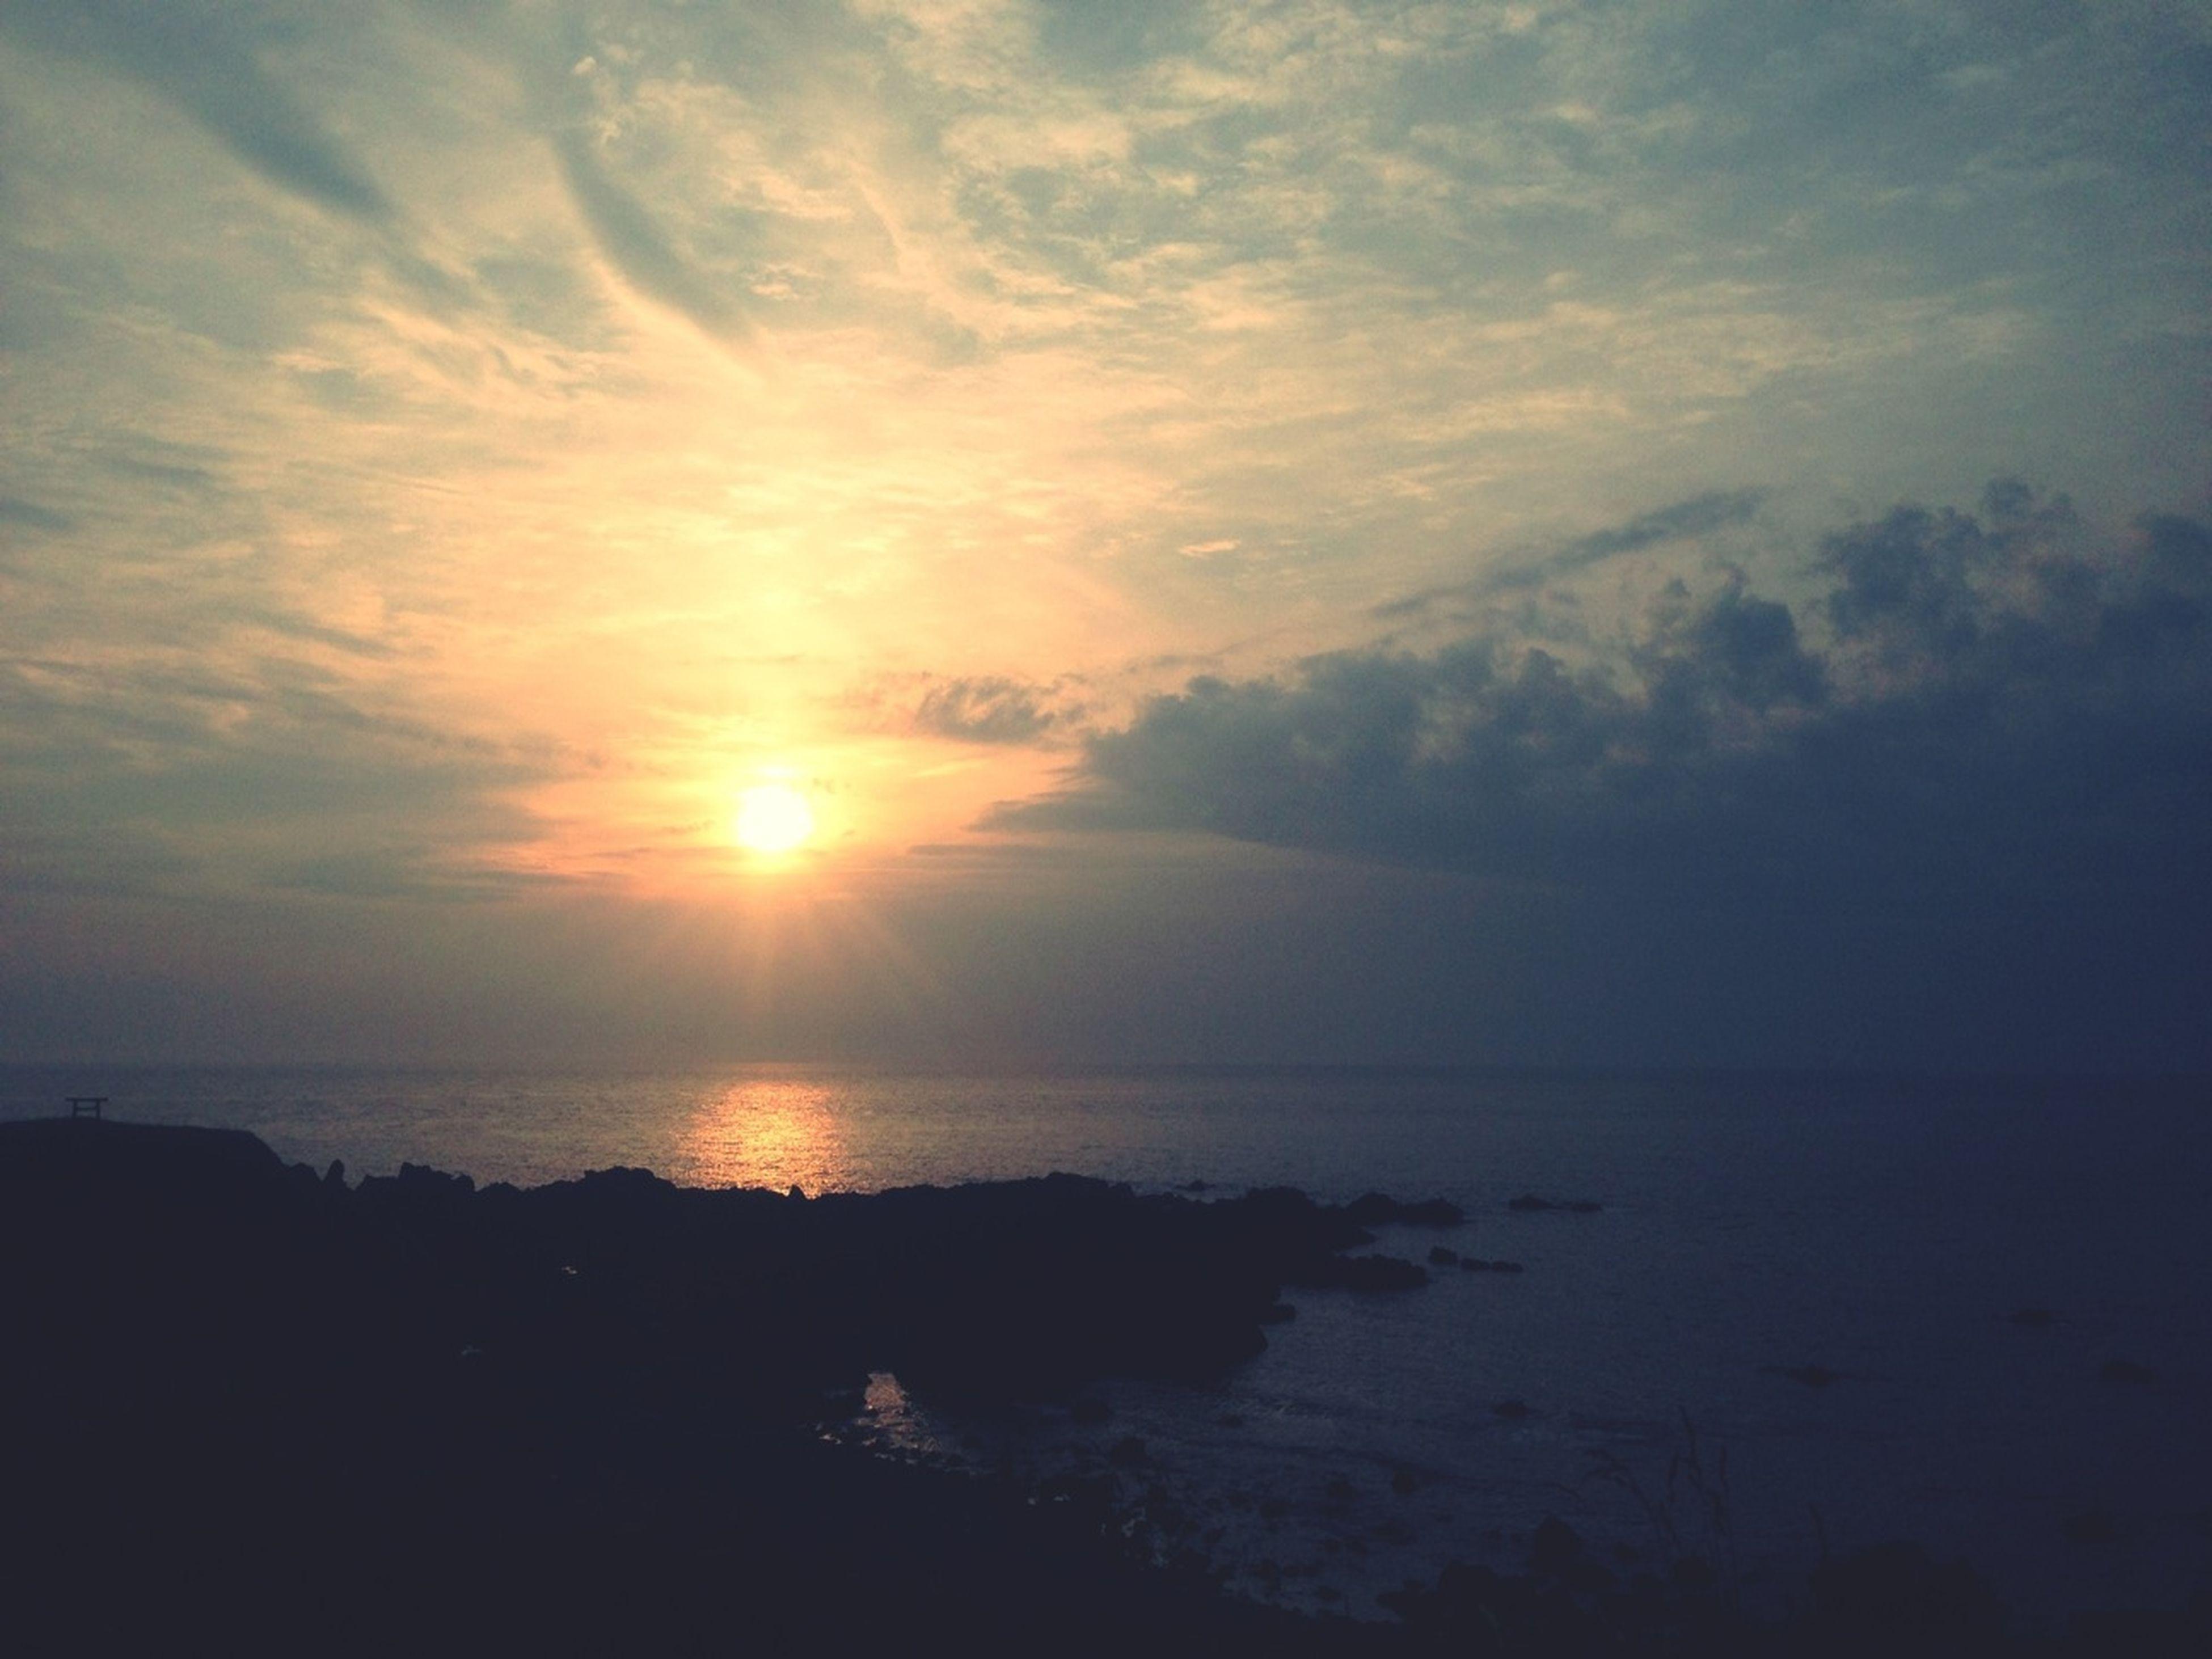 sea, sunset, horizon over water, water, sky, scenics, tranquil scene, beauty in nature, tranquility, sun, cloud - sky, nature, idyllic, silhouette, beach, cloud, shore, sunlight, reflection, orange color